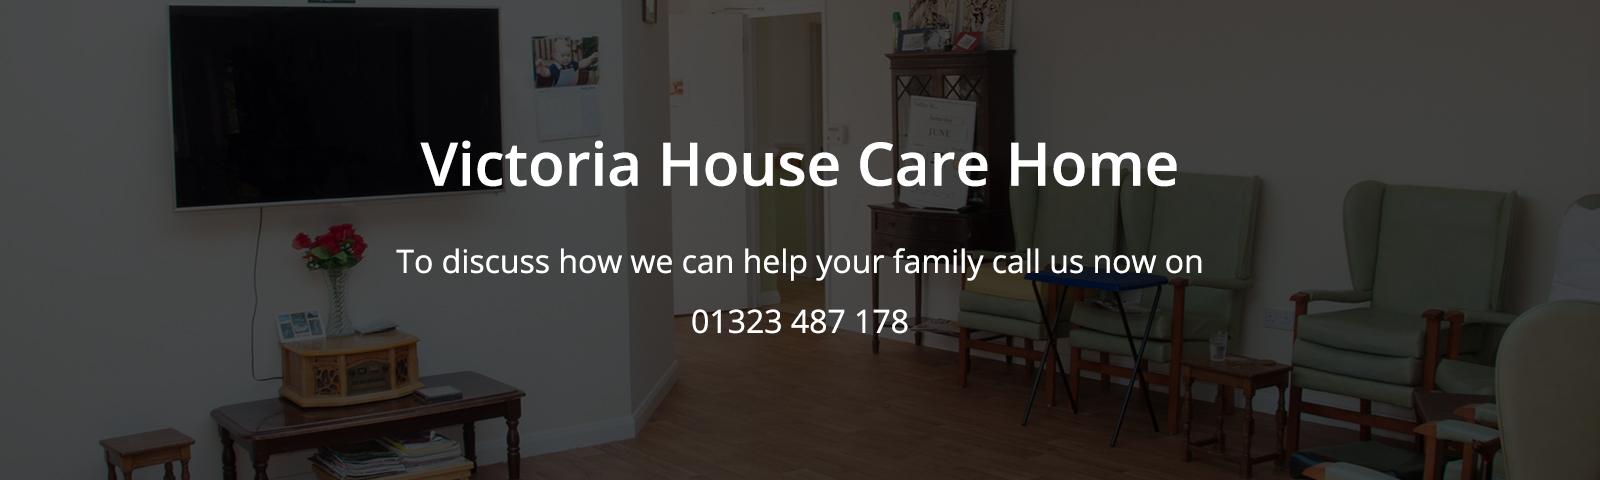 Victoria House Care